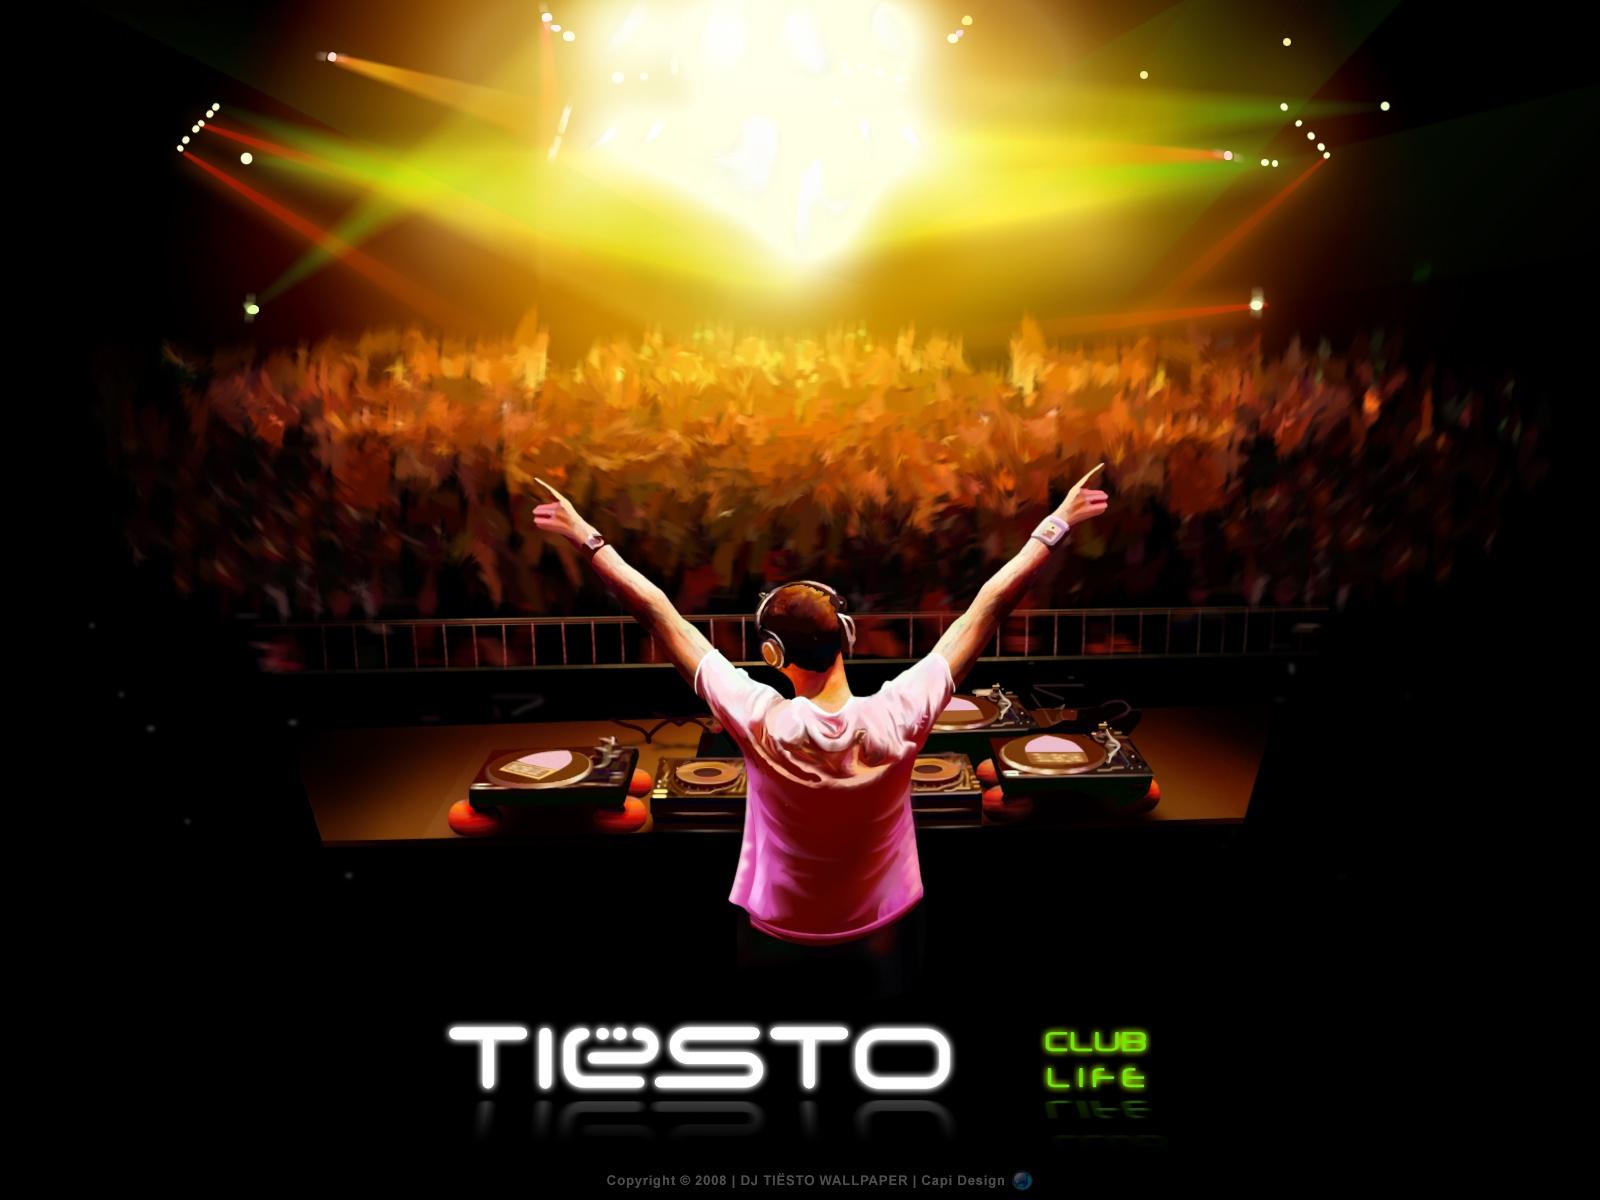 1600x1200 tiesto club life wallpaper music and dance